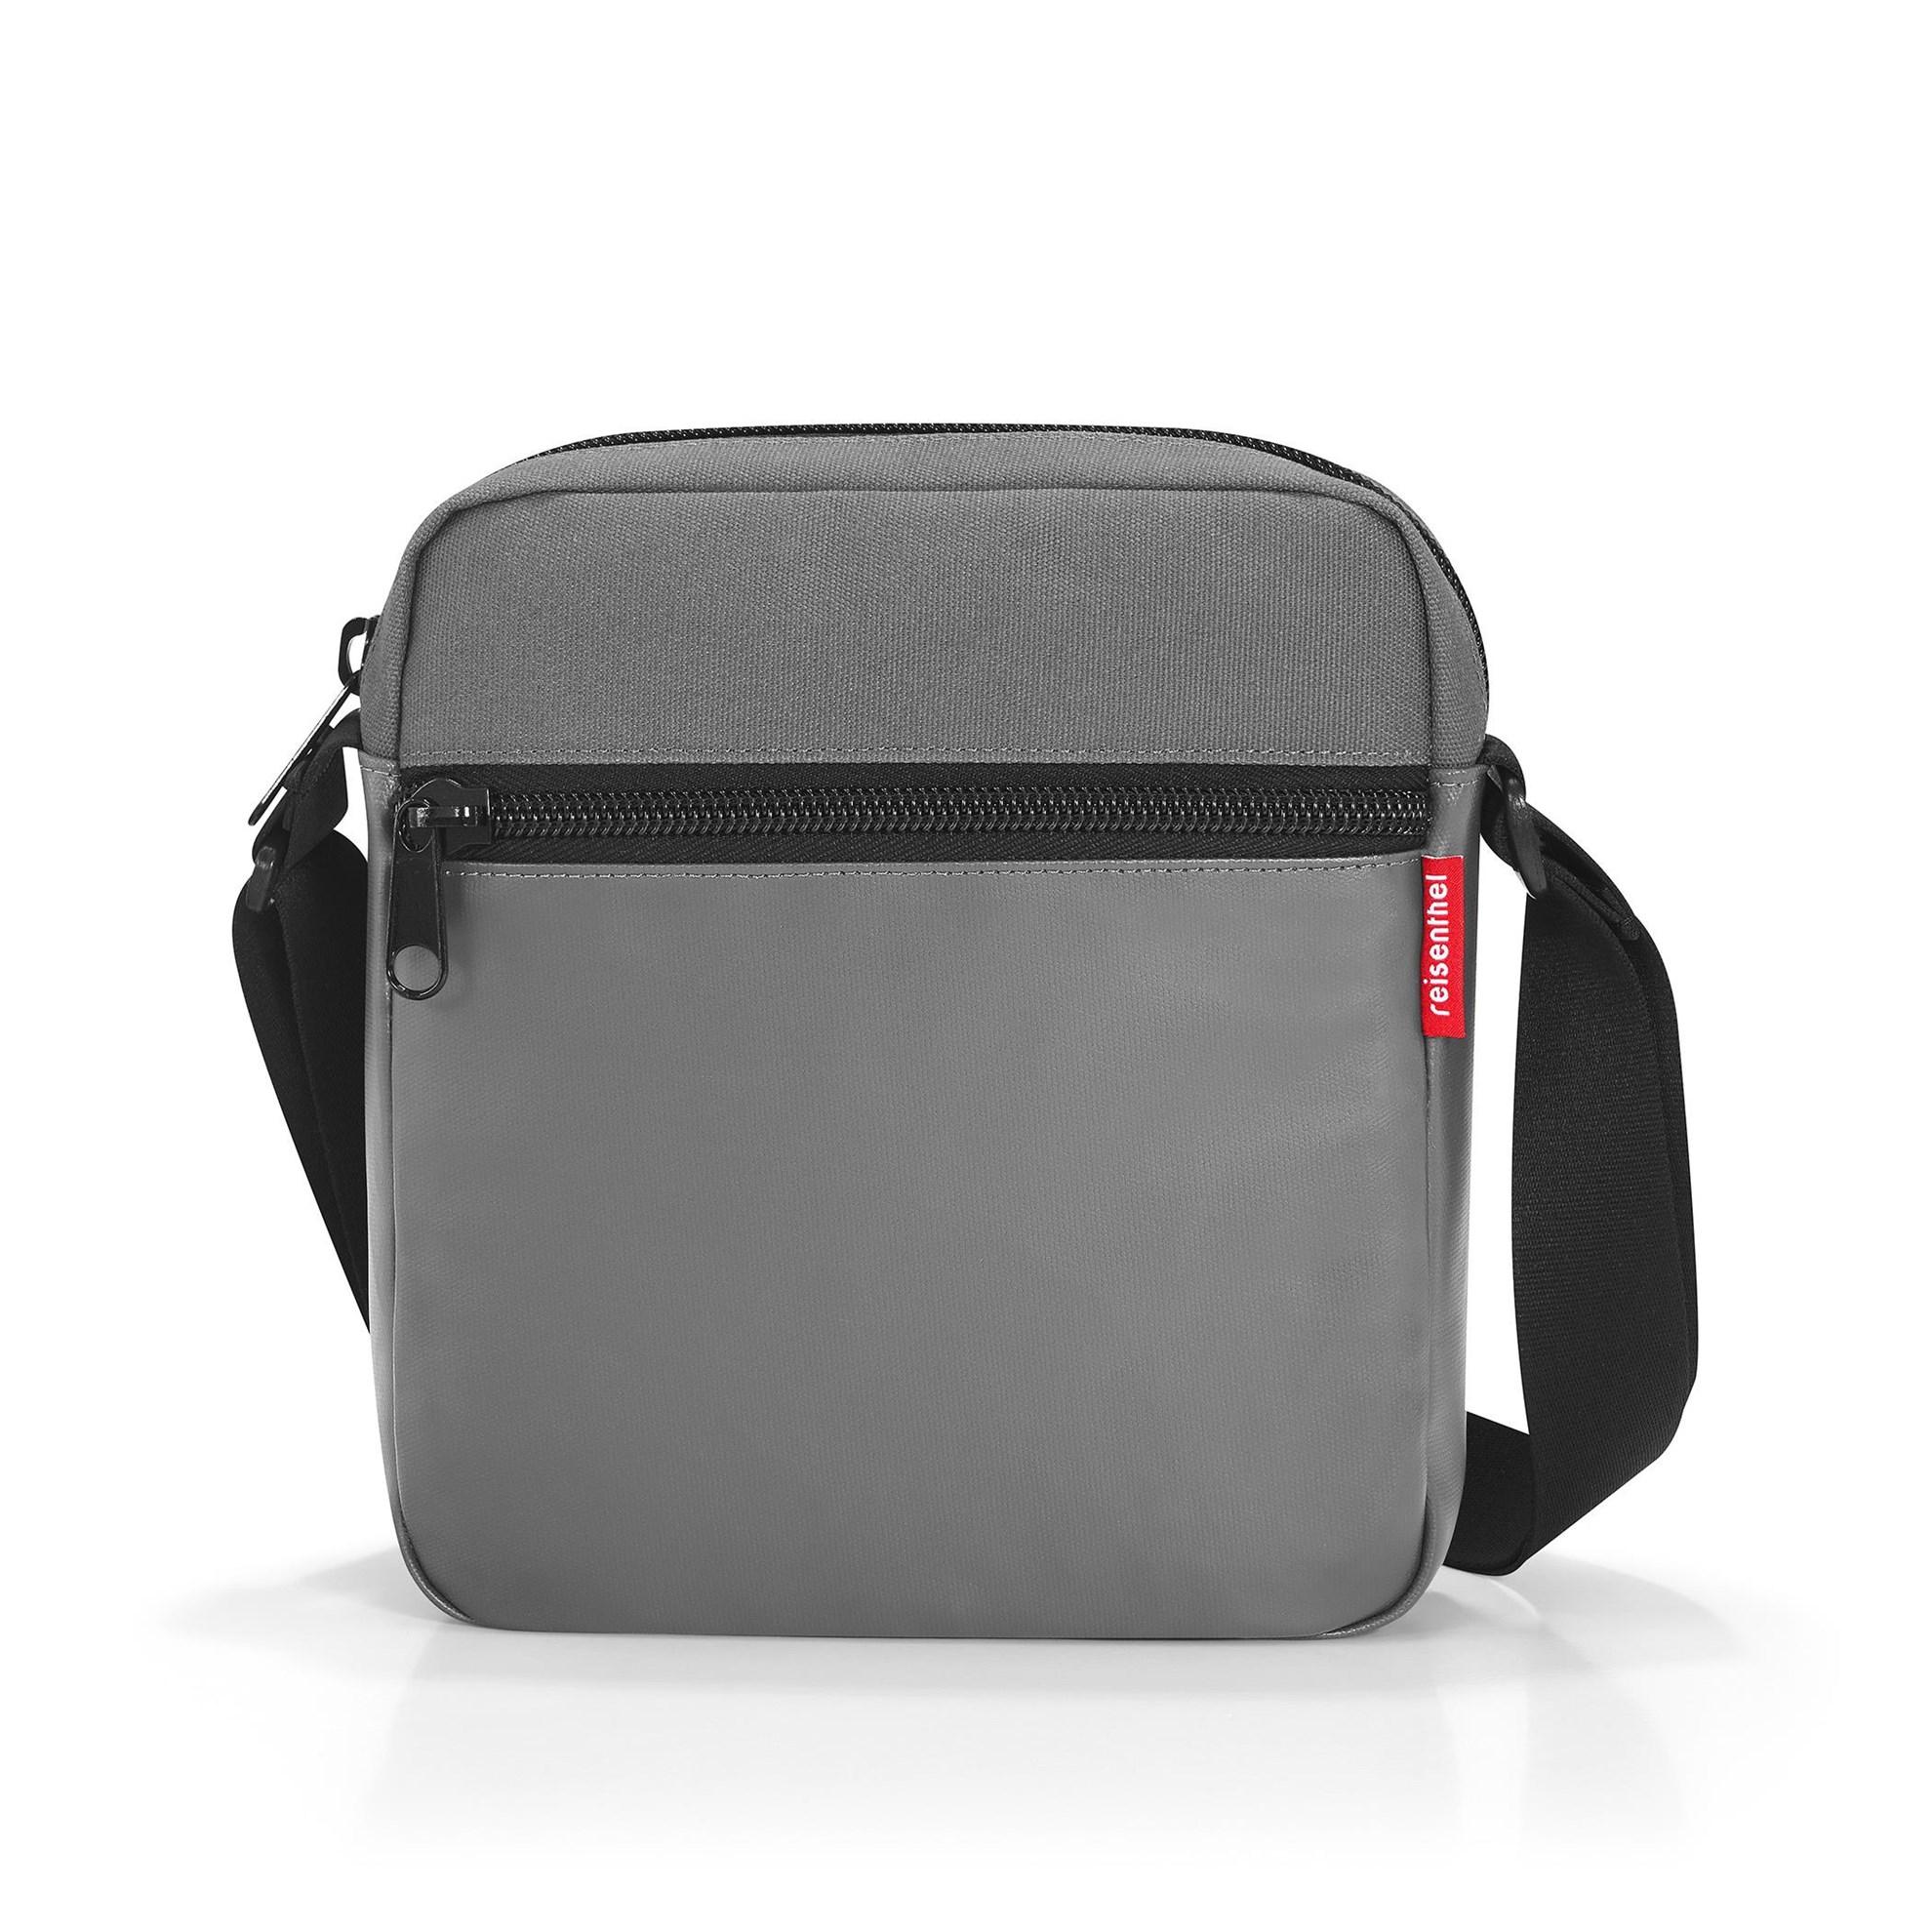 Taška přes rameno CROSSBAG canvas grey_0